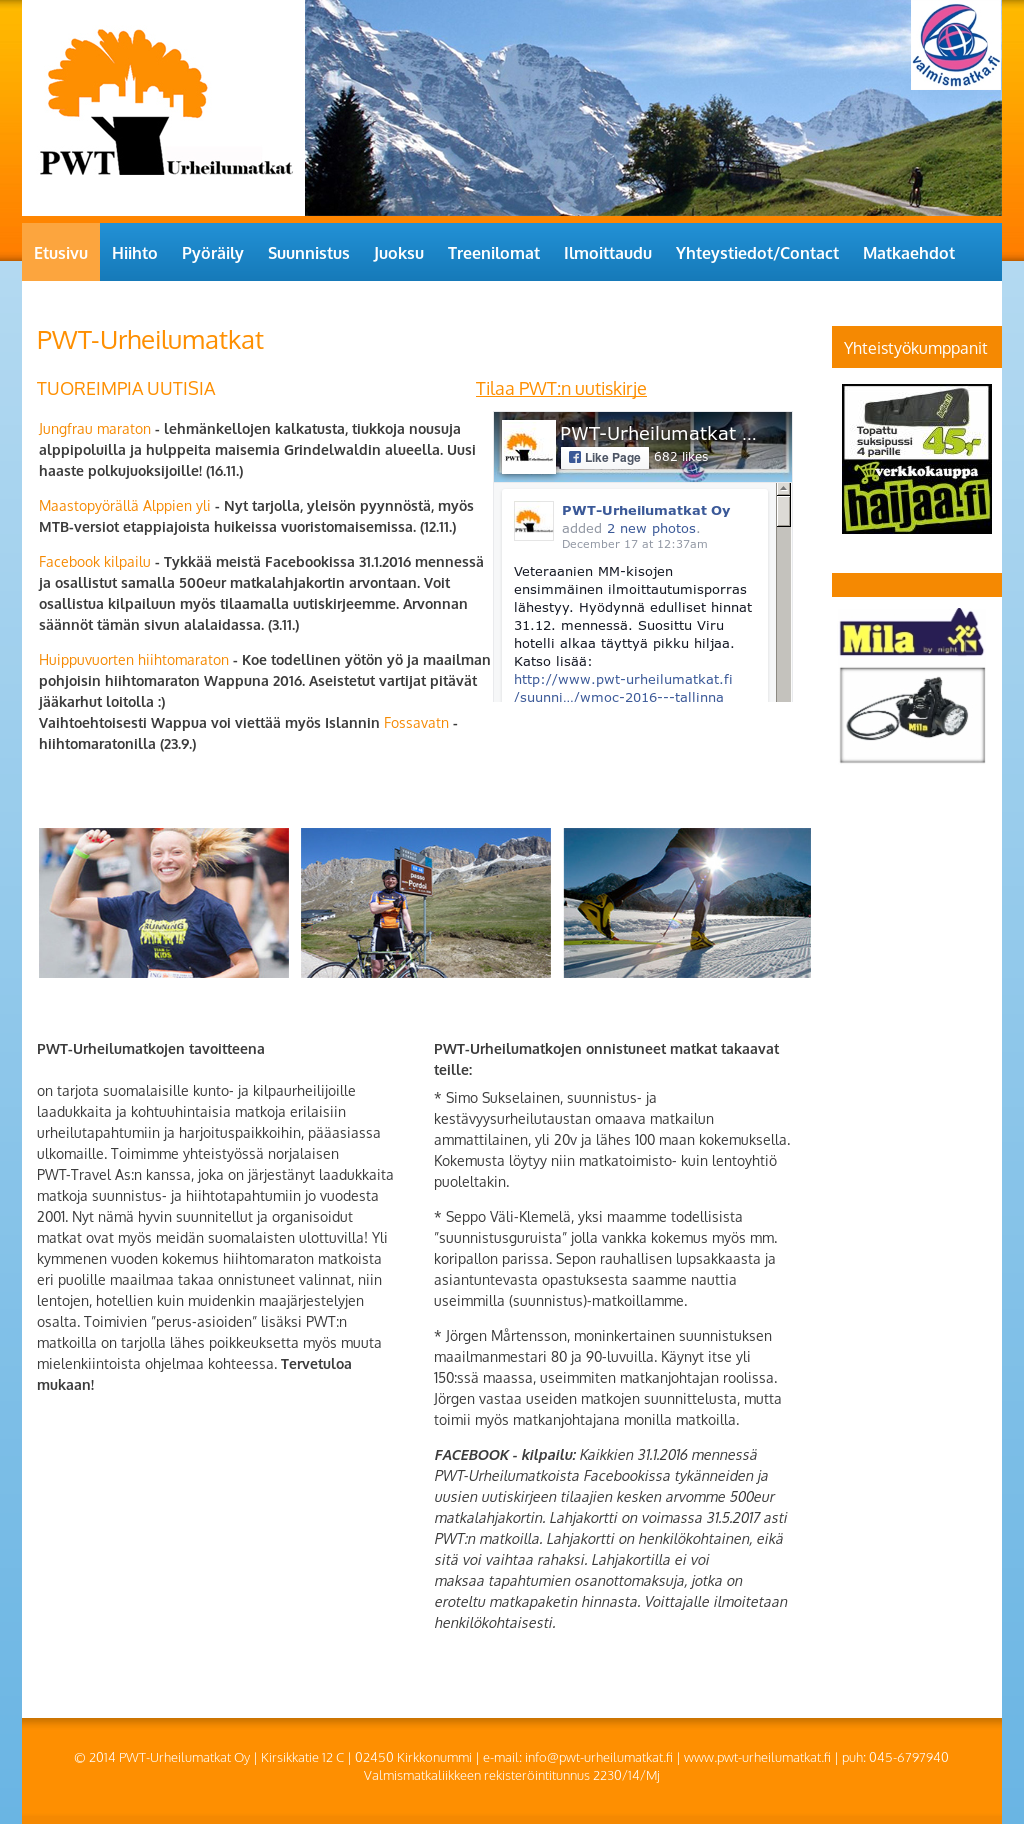 Pwt-urheilumatkat Oy Competitors, Revenue and Employees